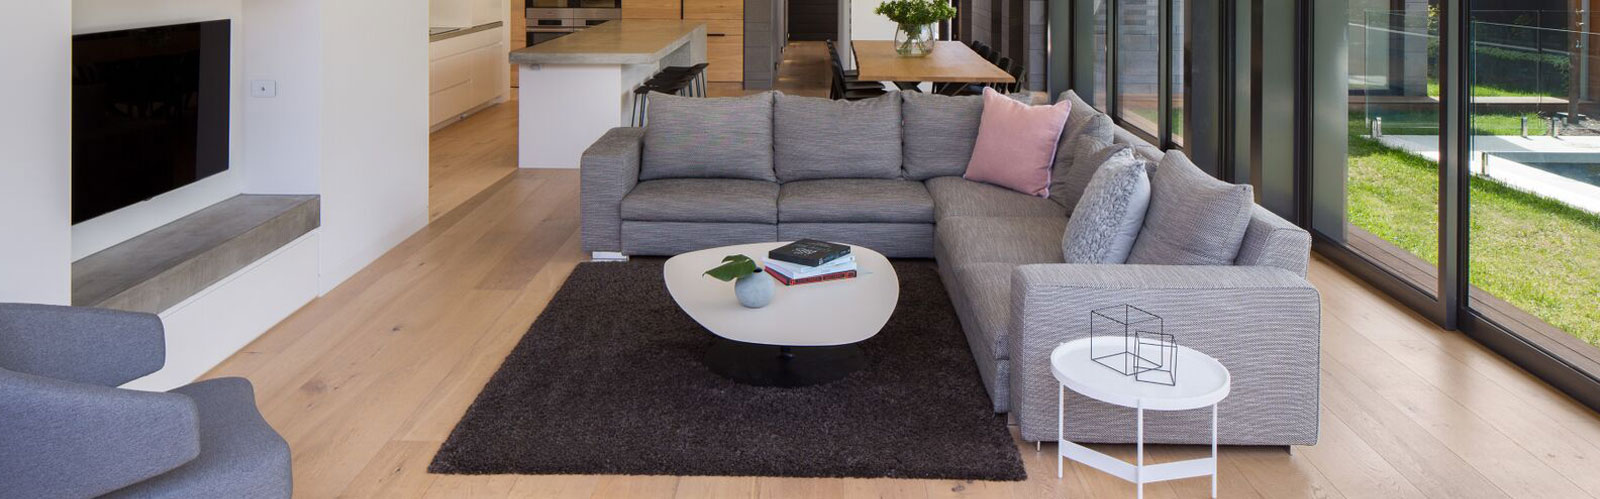 bamboo-floor-installation-melbourne